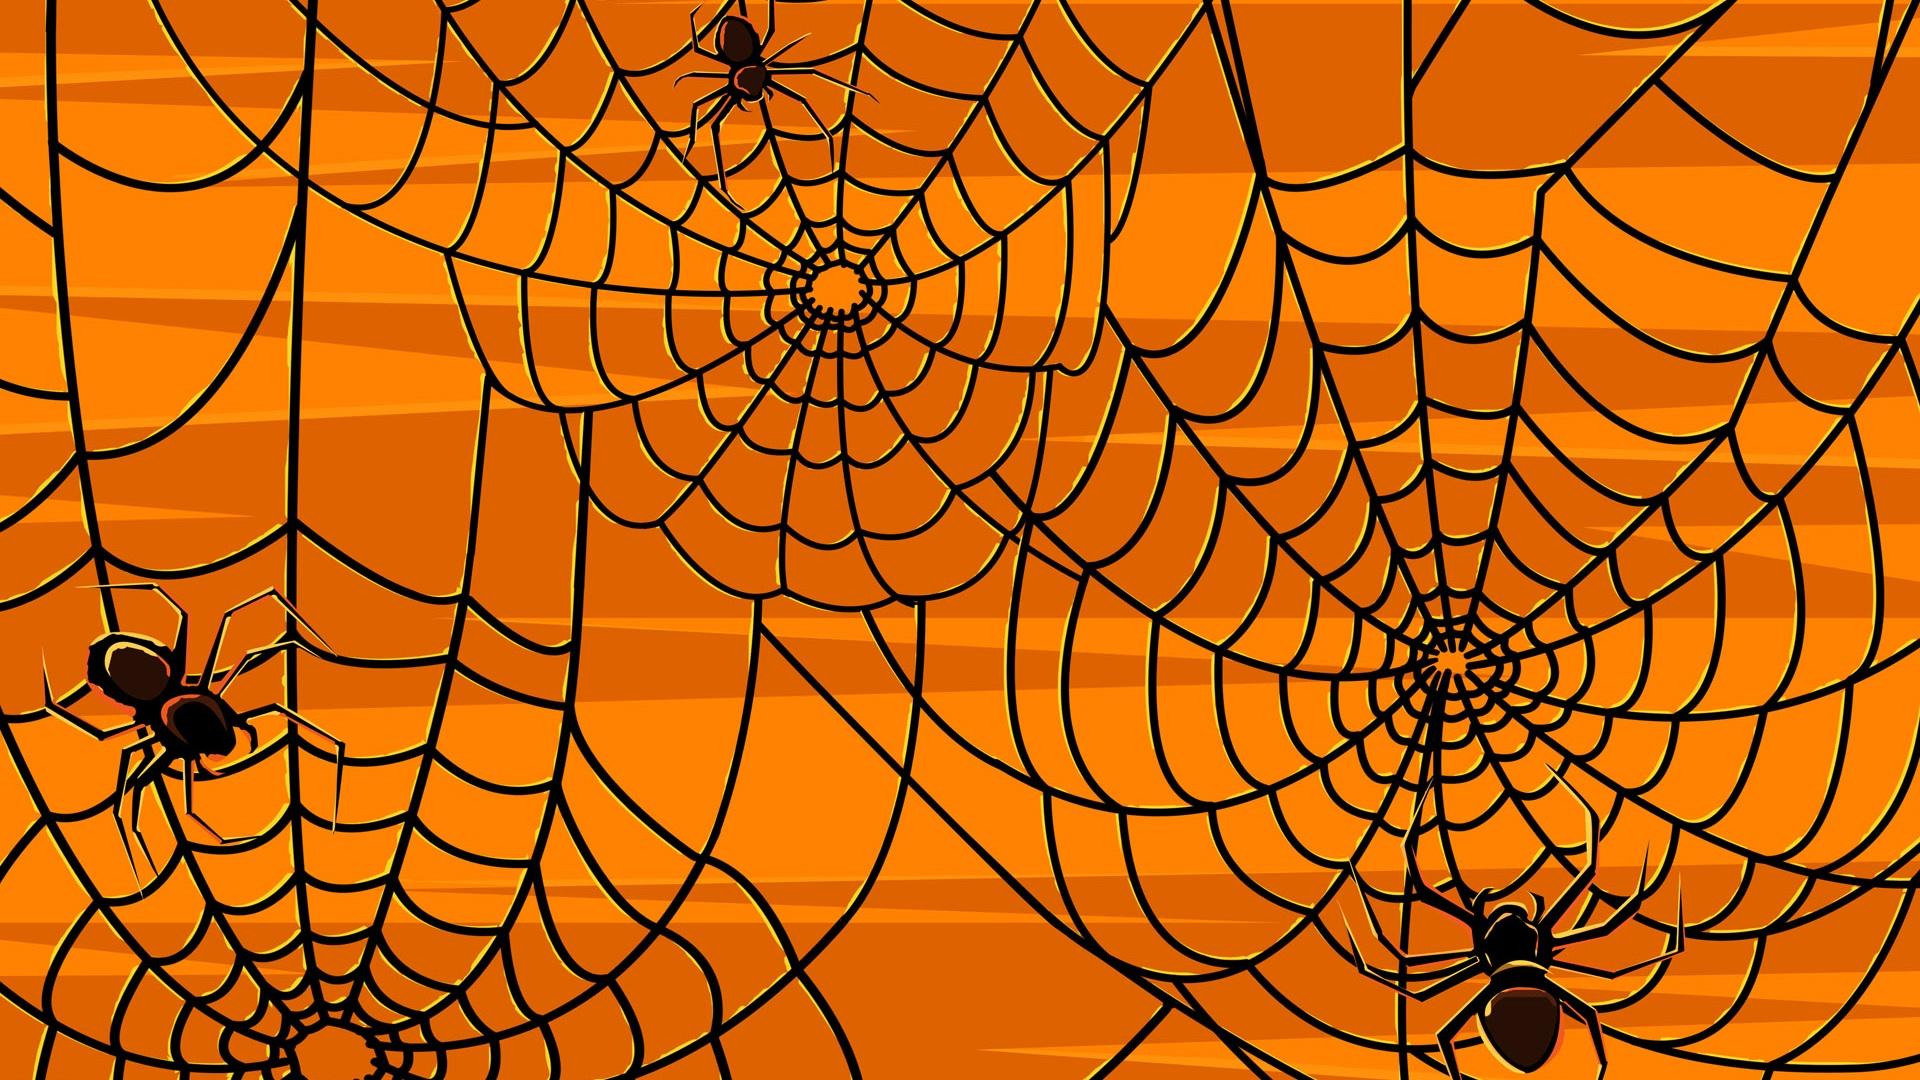 HD Halloween Wallpapers Free - WallpaperSafari